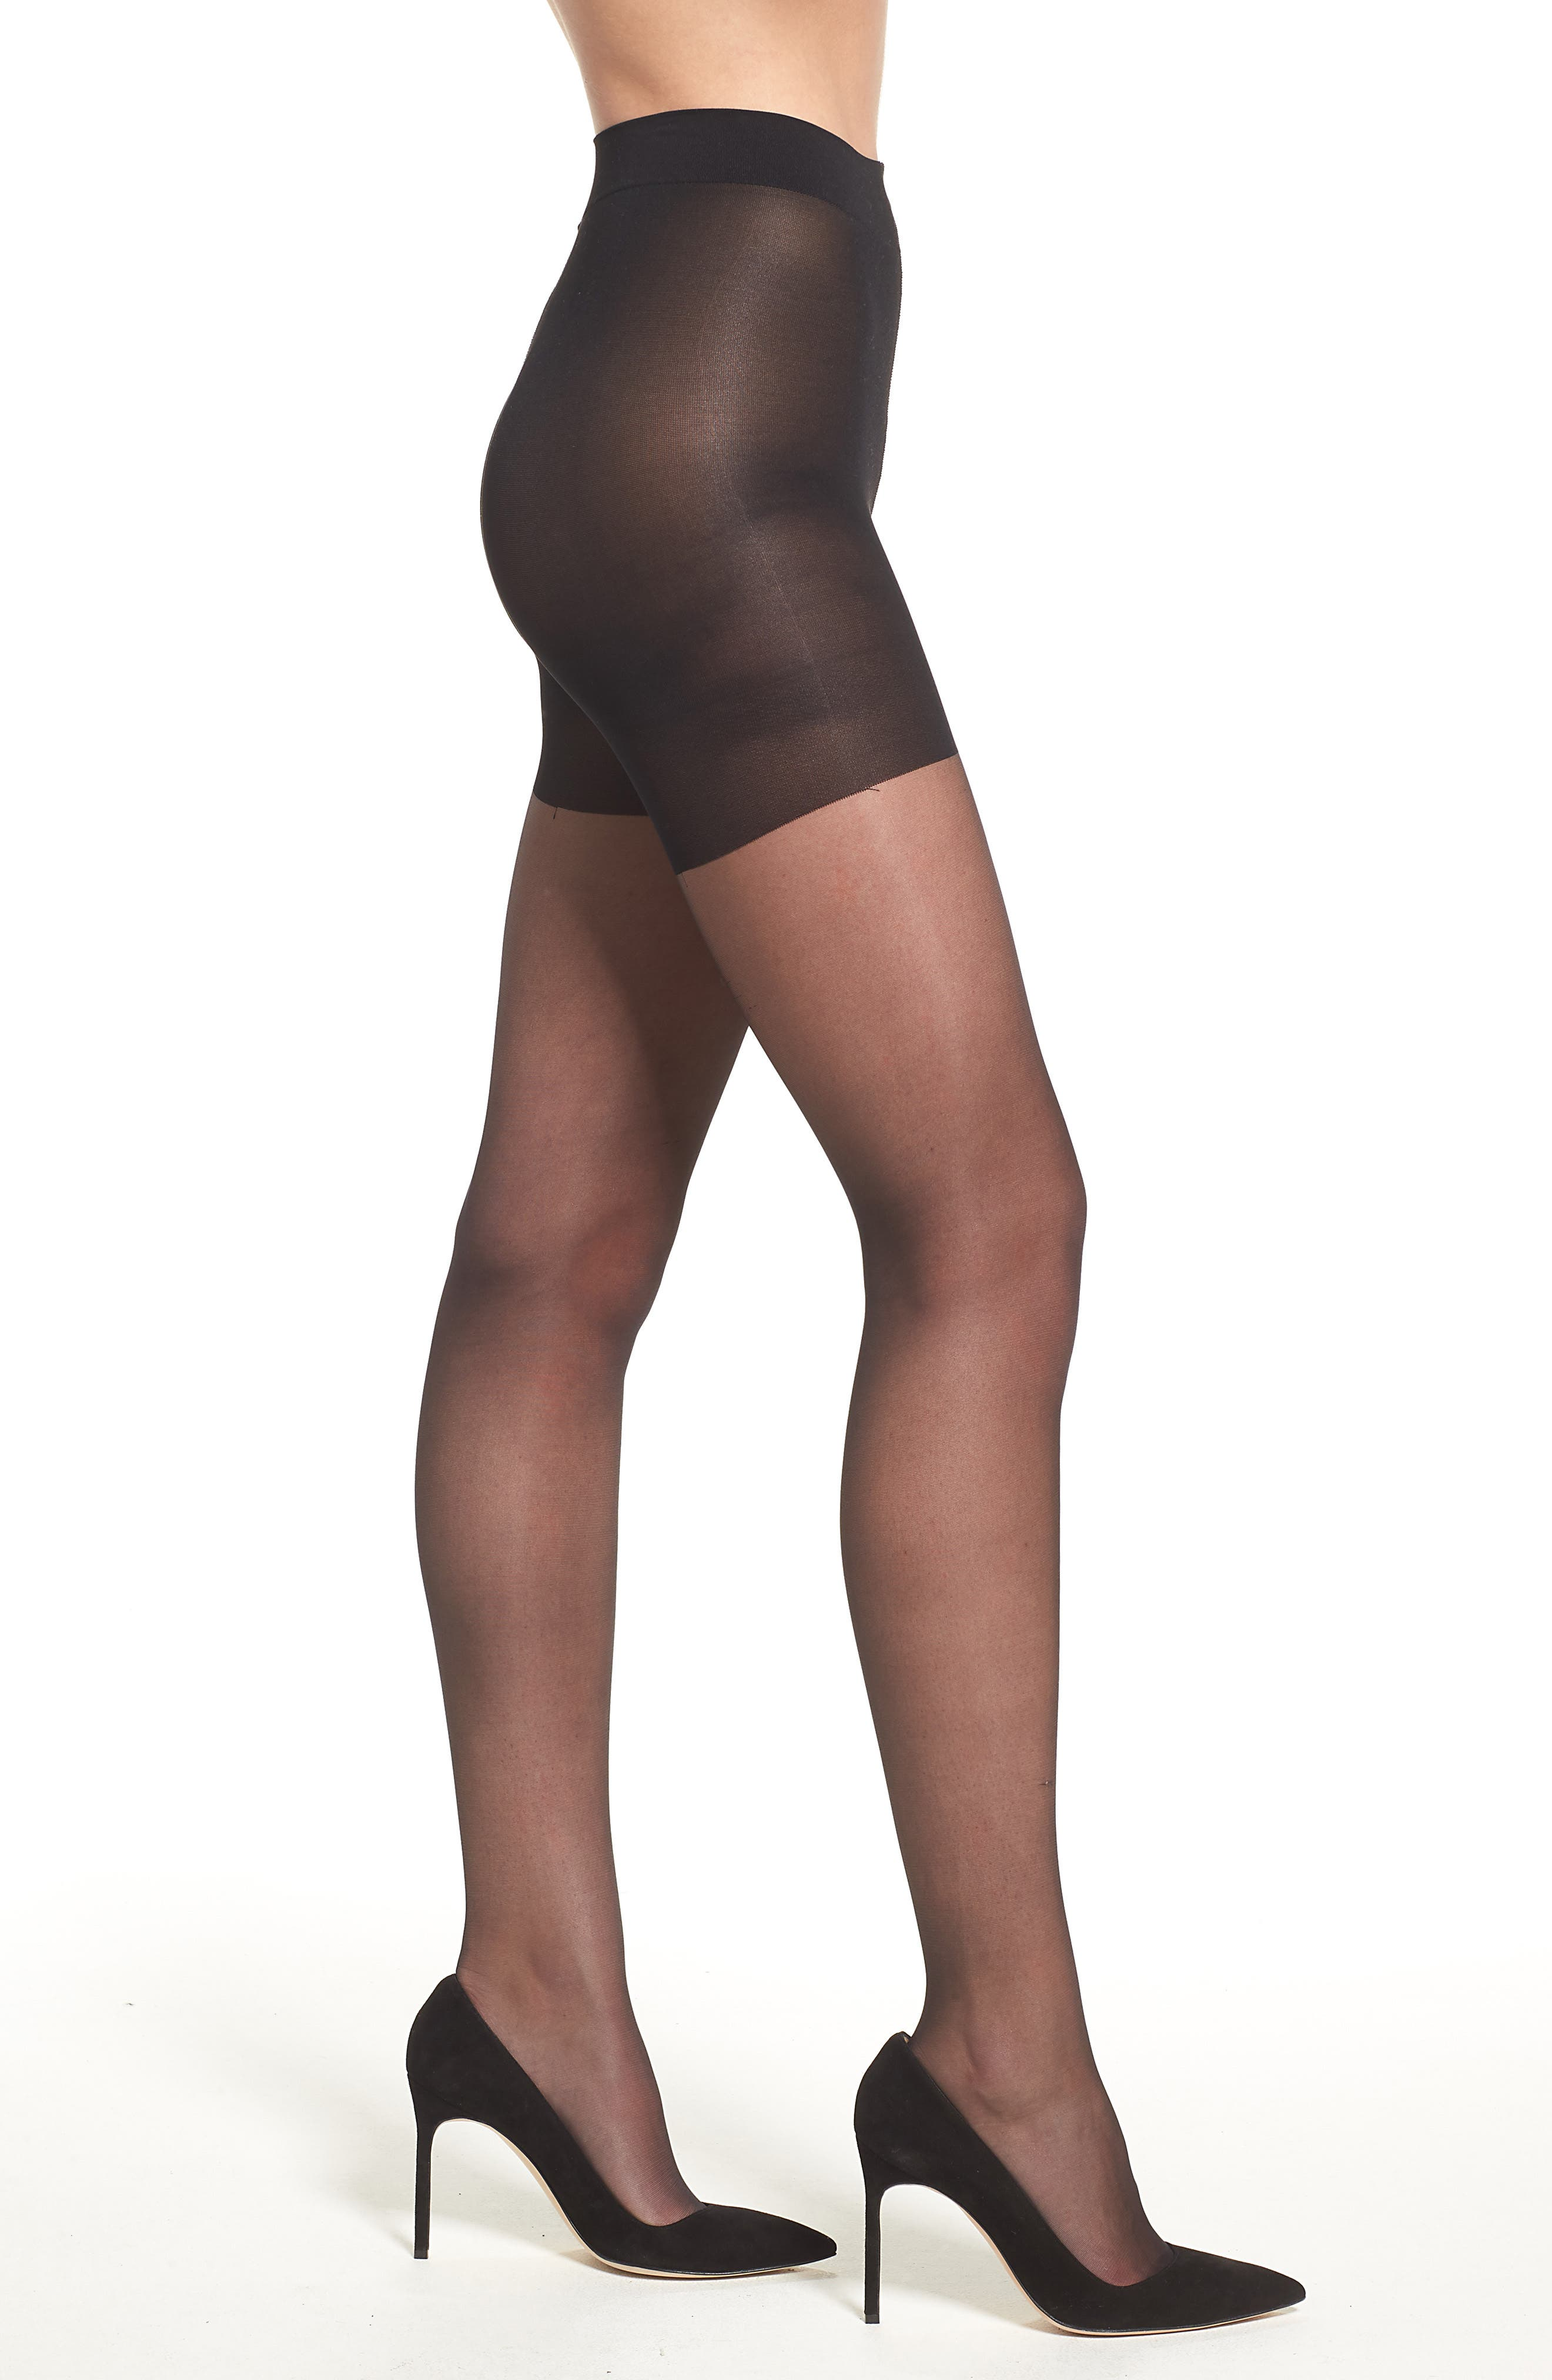 Sheer Control Top Pantyhose,                             Main thumbnail 1, color,                             BLACK